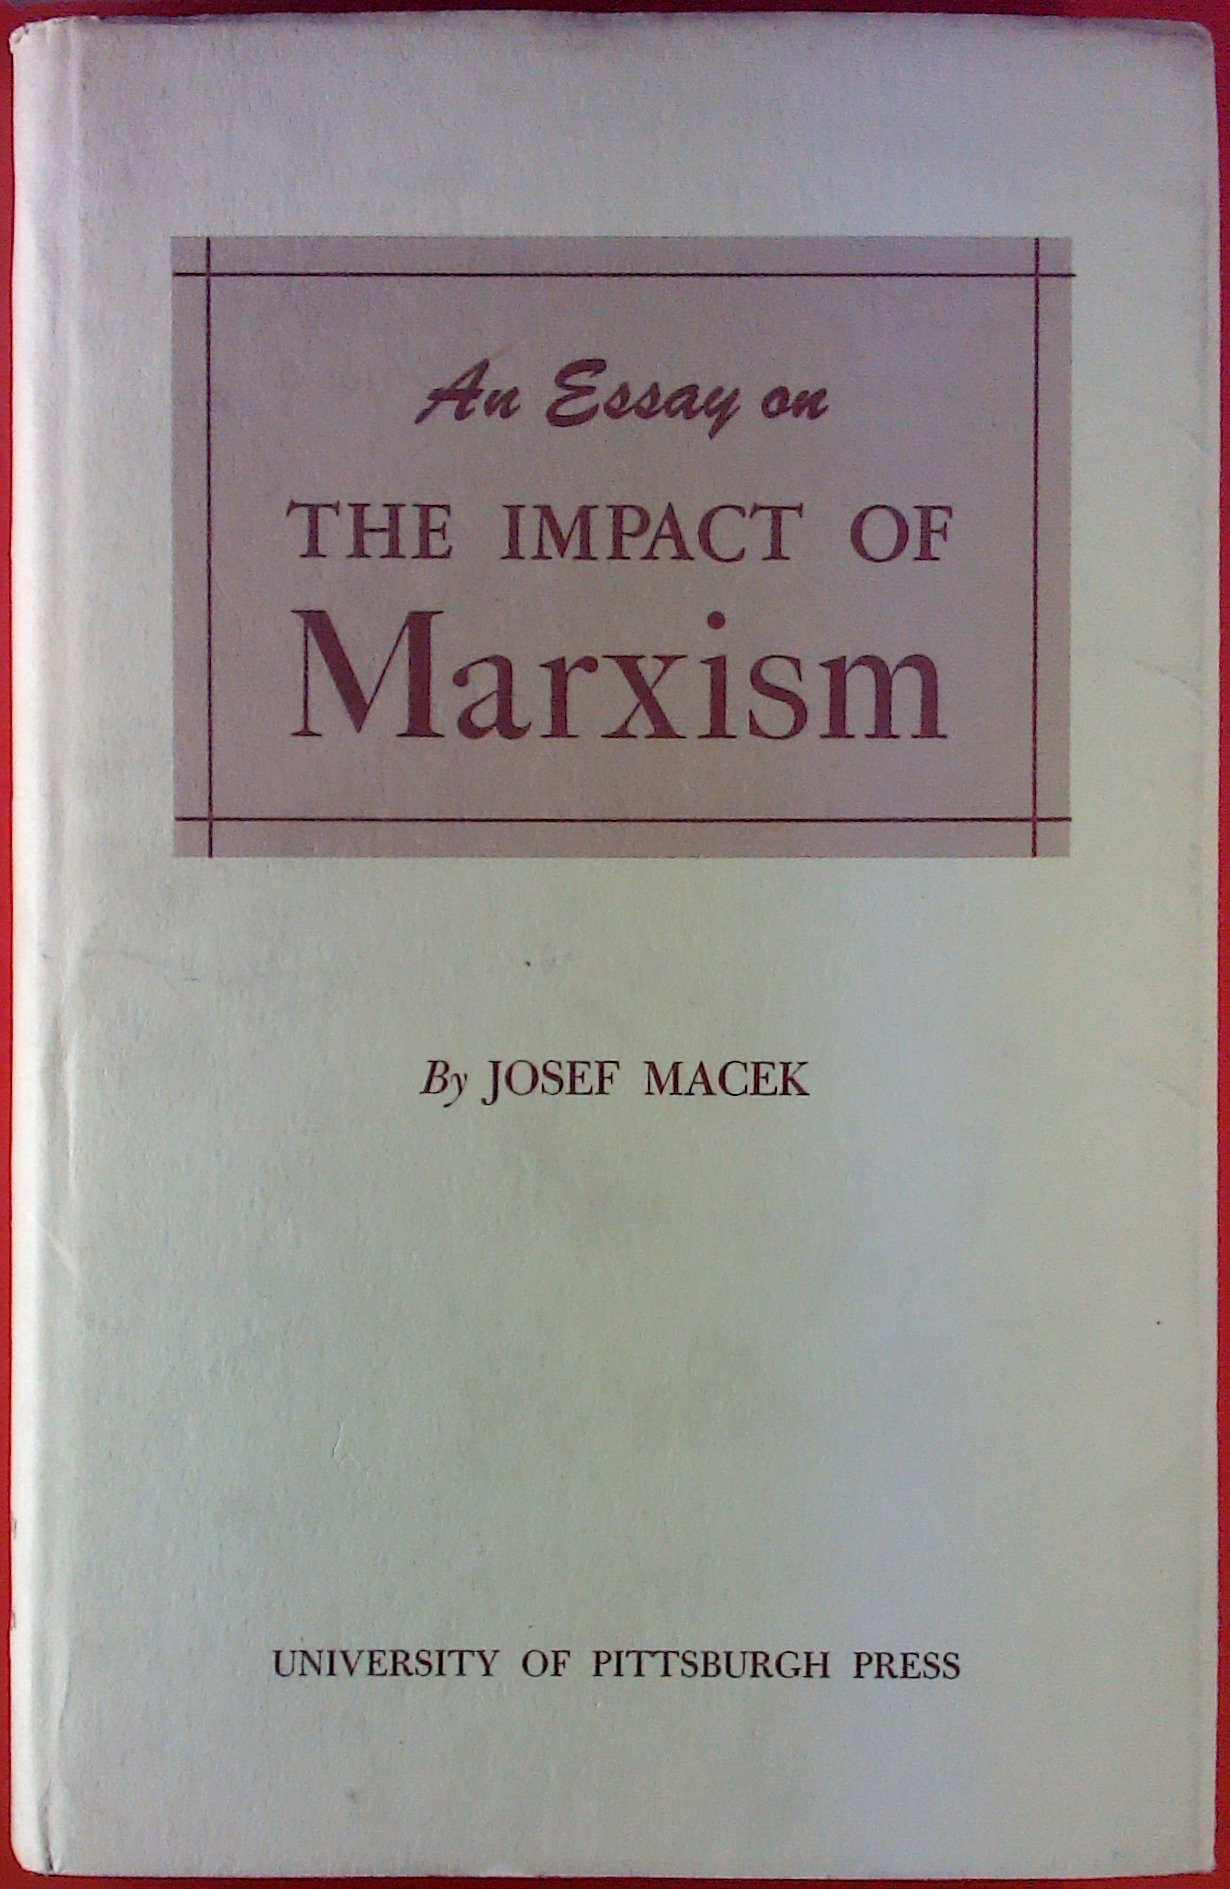 Health Education Essay  Sample Argumentative Essay High School also Global Warming Essay In English An Essay On The Impact Of Marxism Josef Macek Amazoncom Books Essay On Importance Of English Language